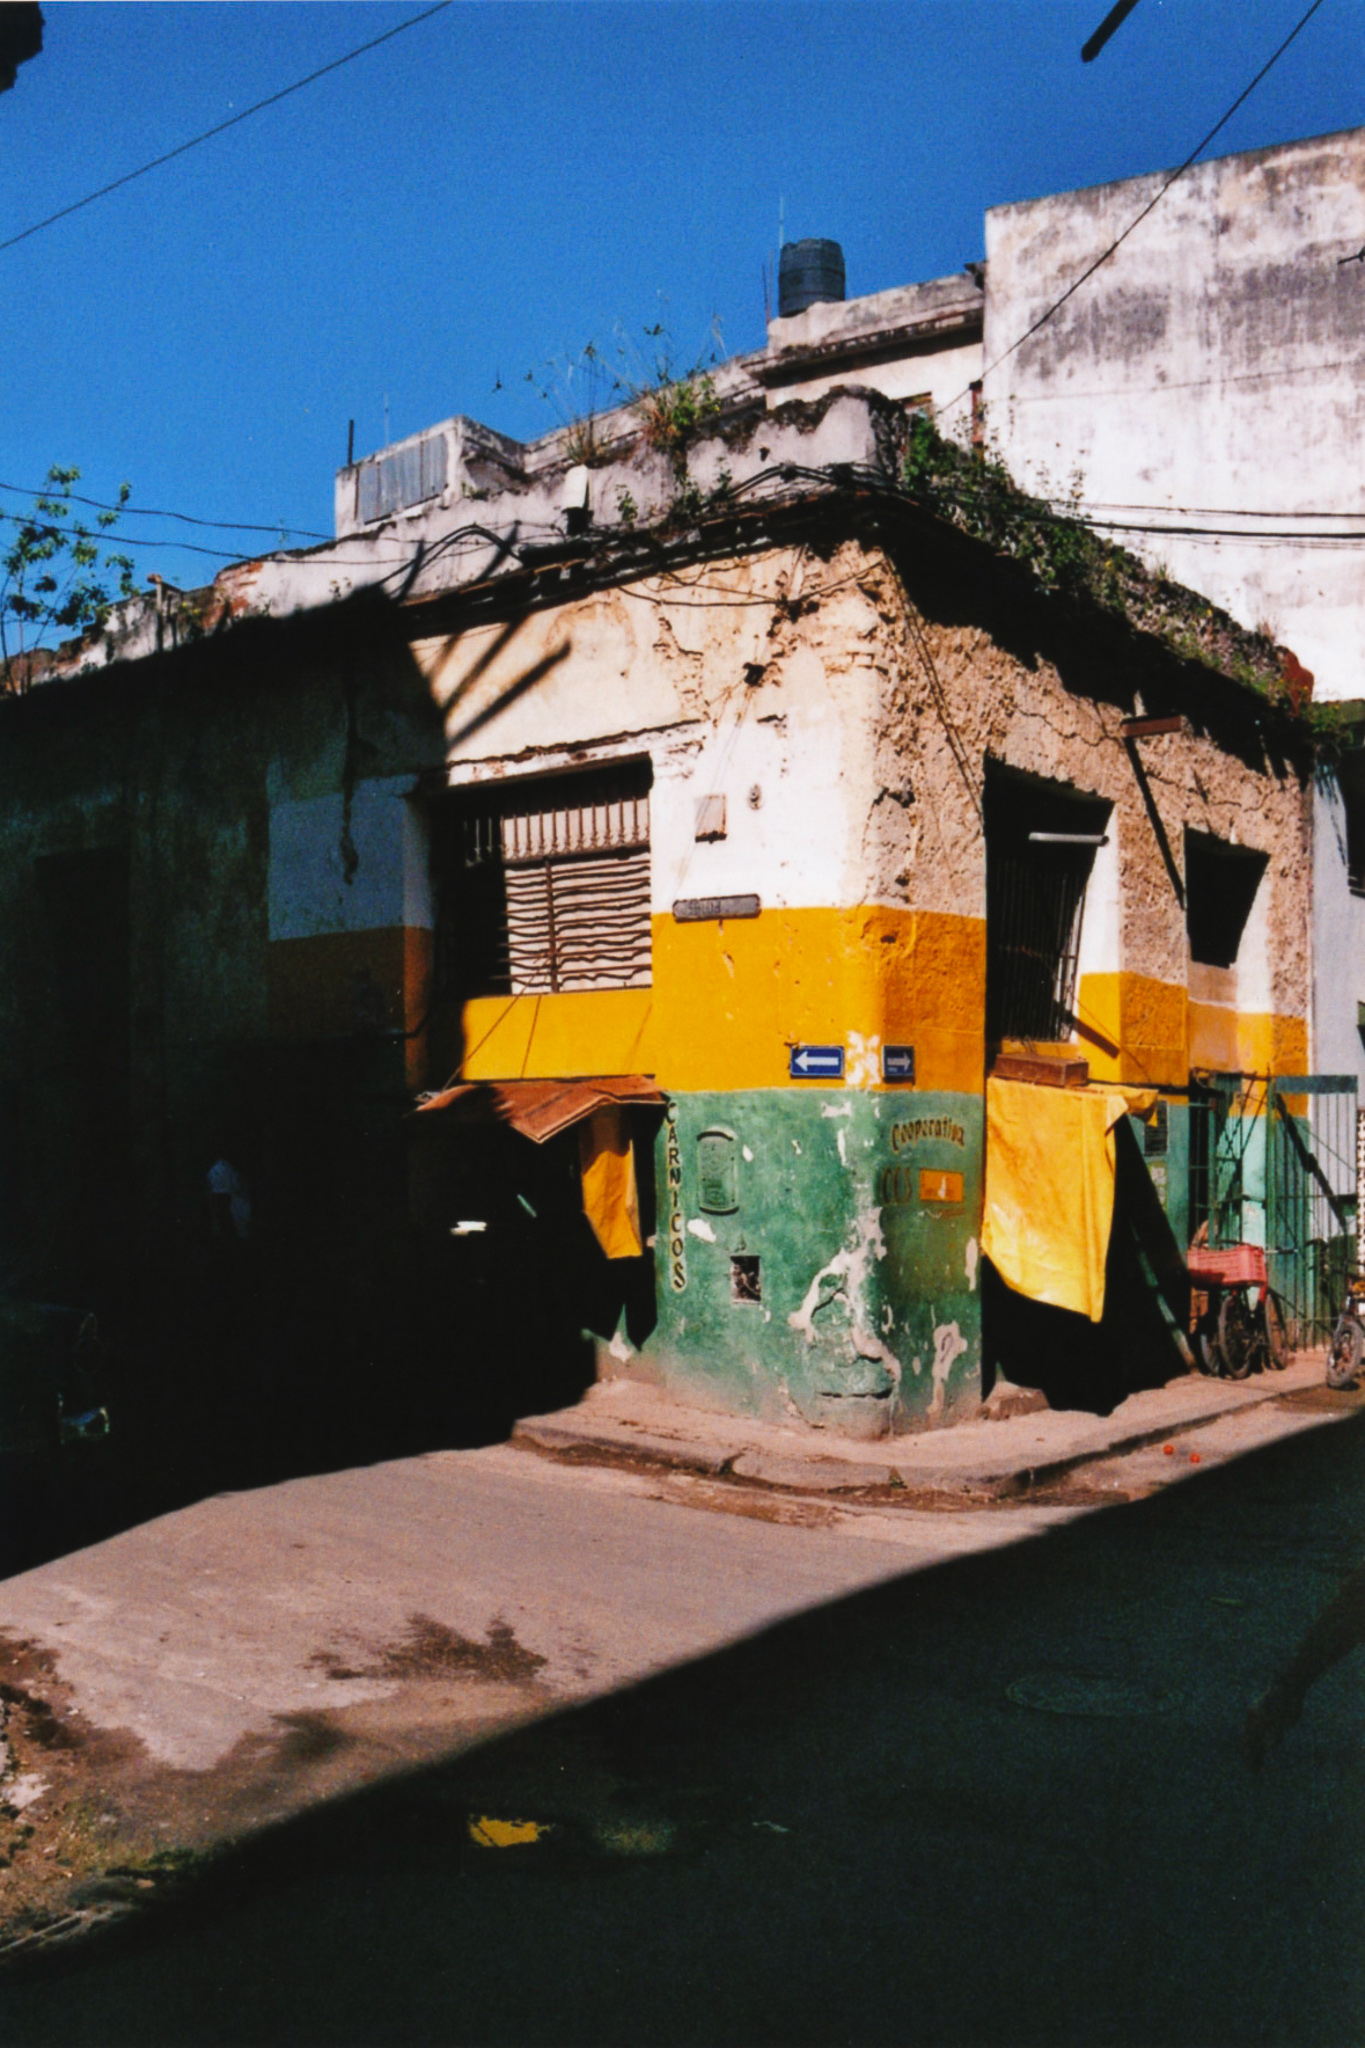 Kuba-2017-12-Analog-035.jpg